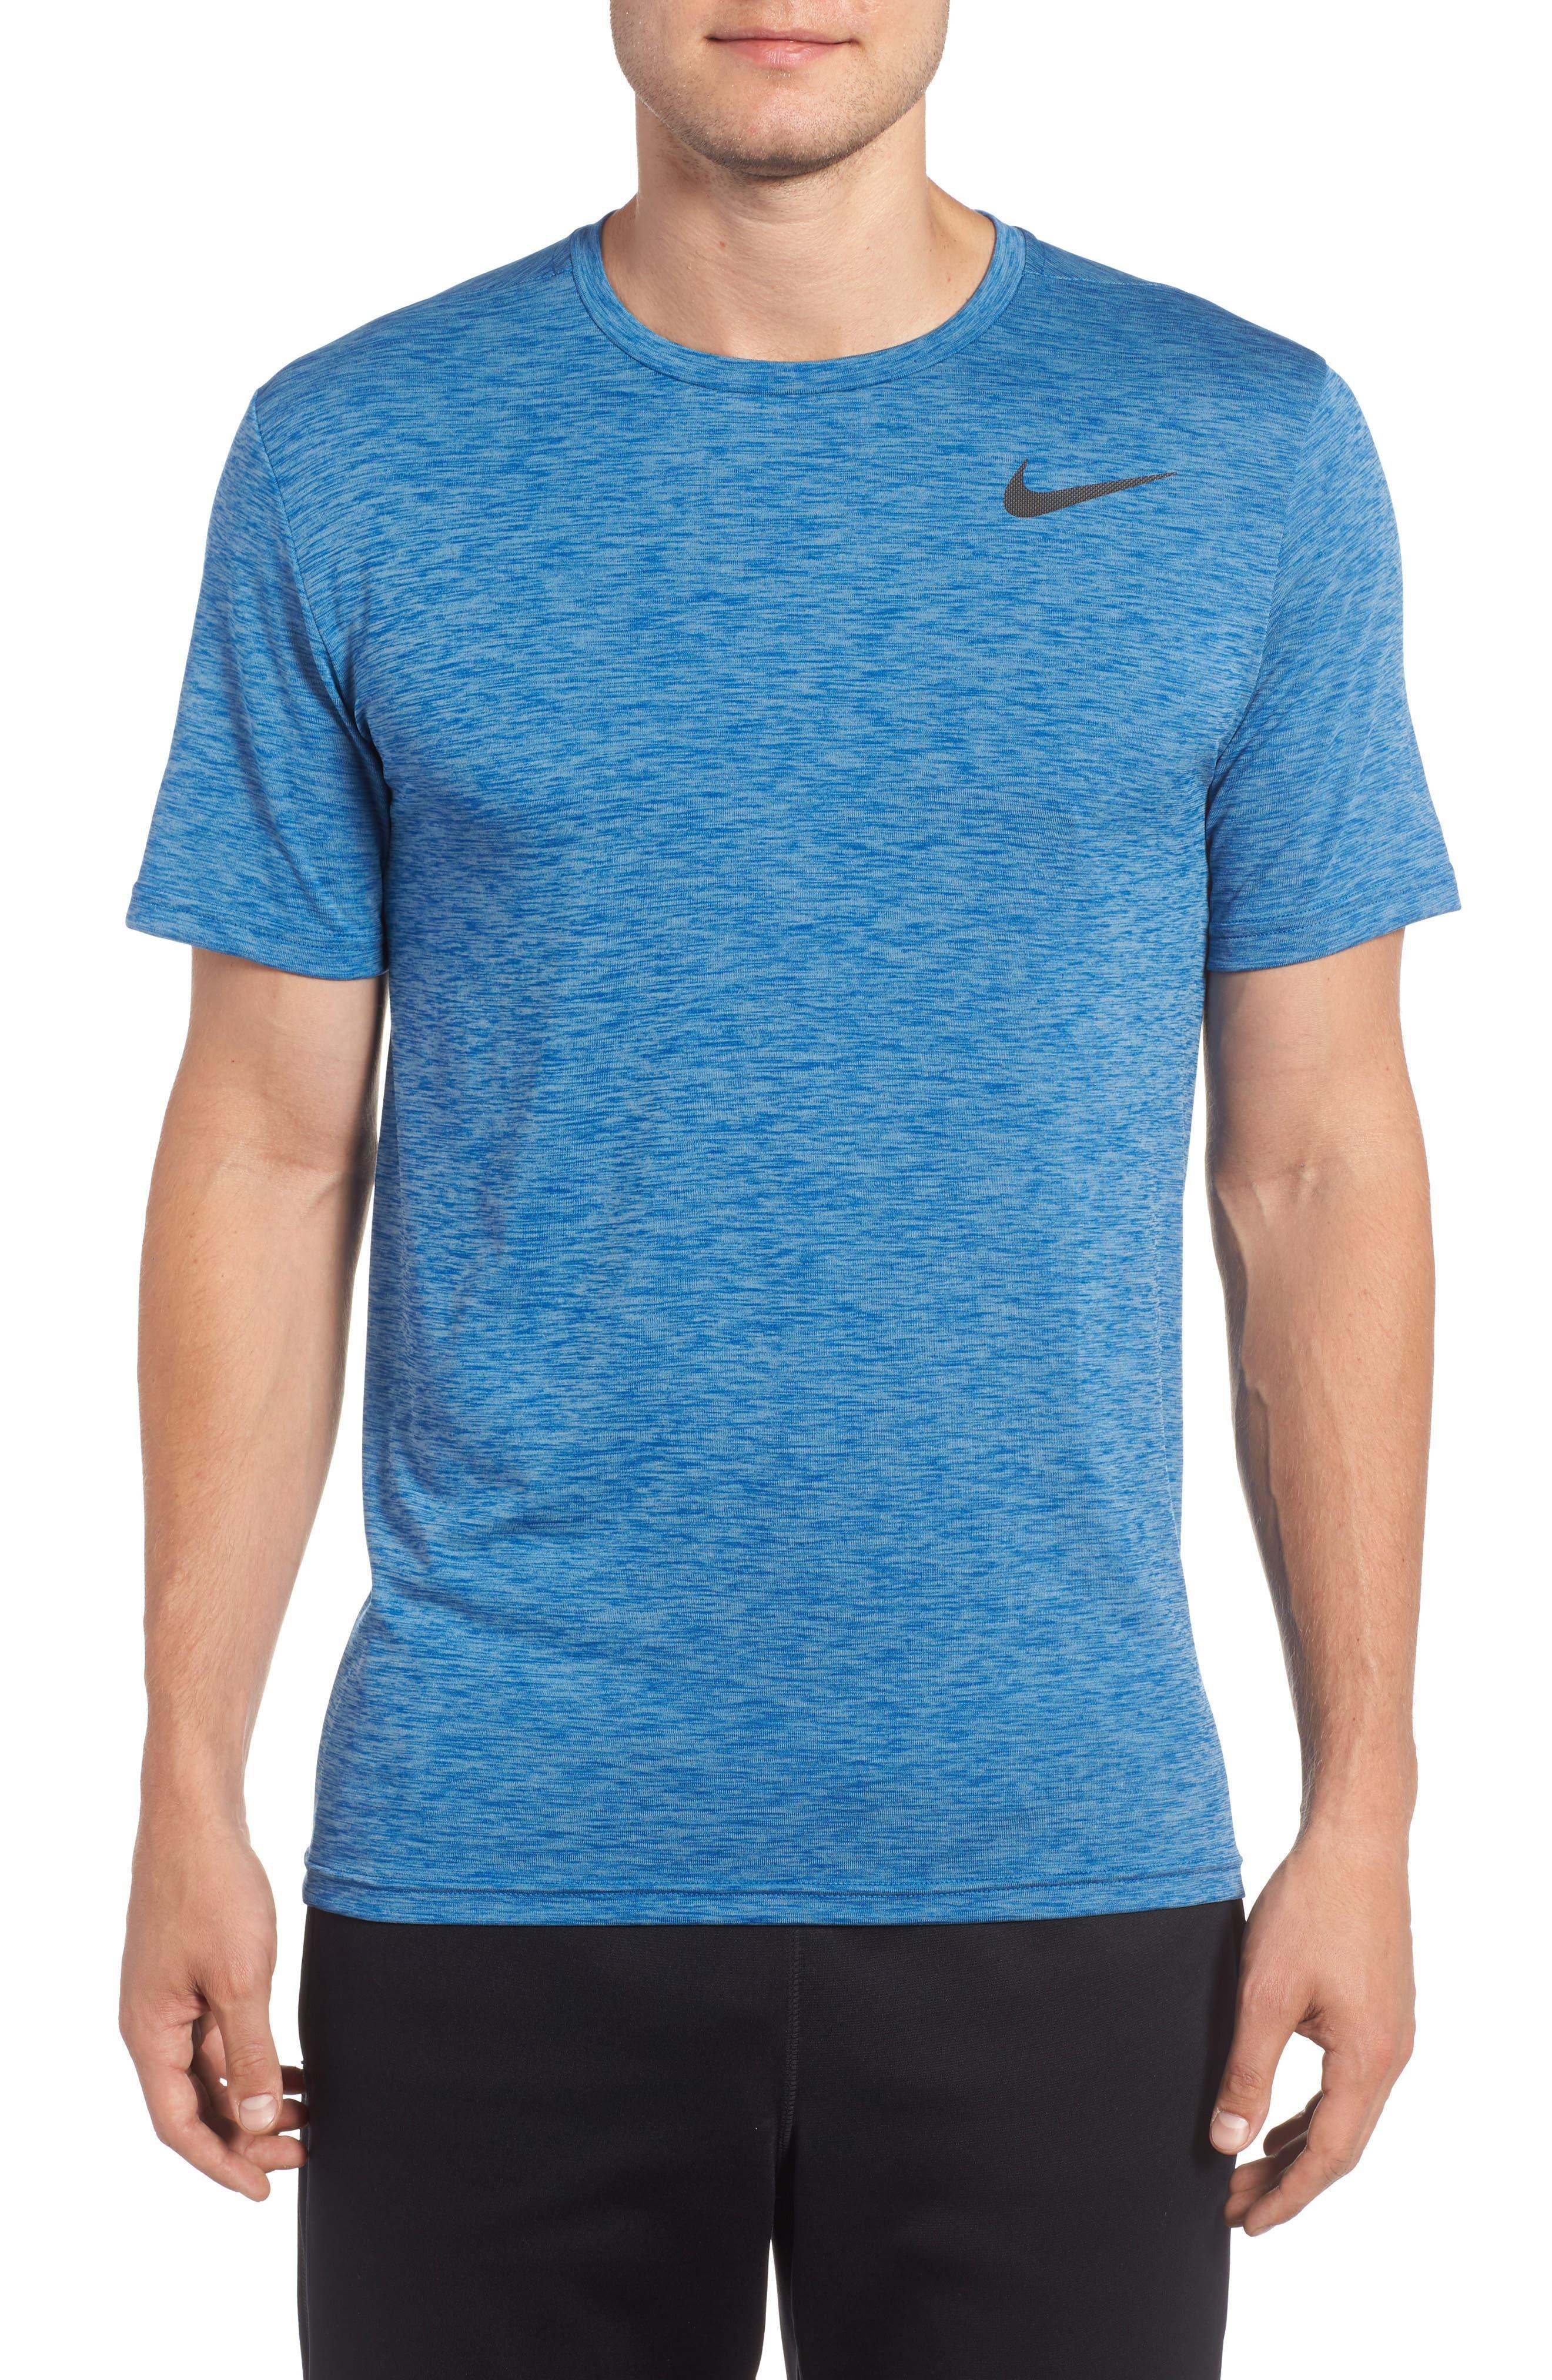 Alternate Image 1 Selected - Nike Hyper Dry Training Tee